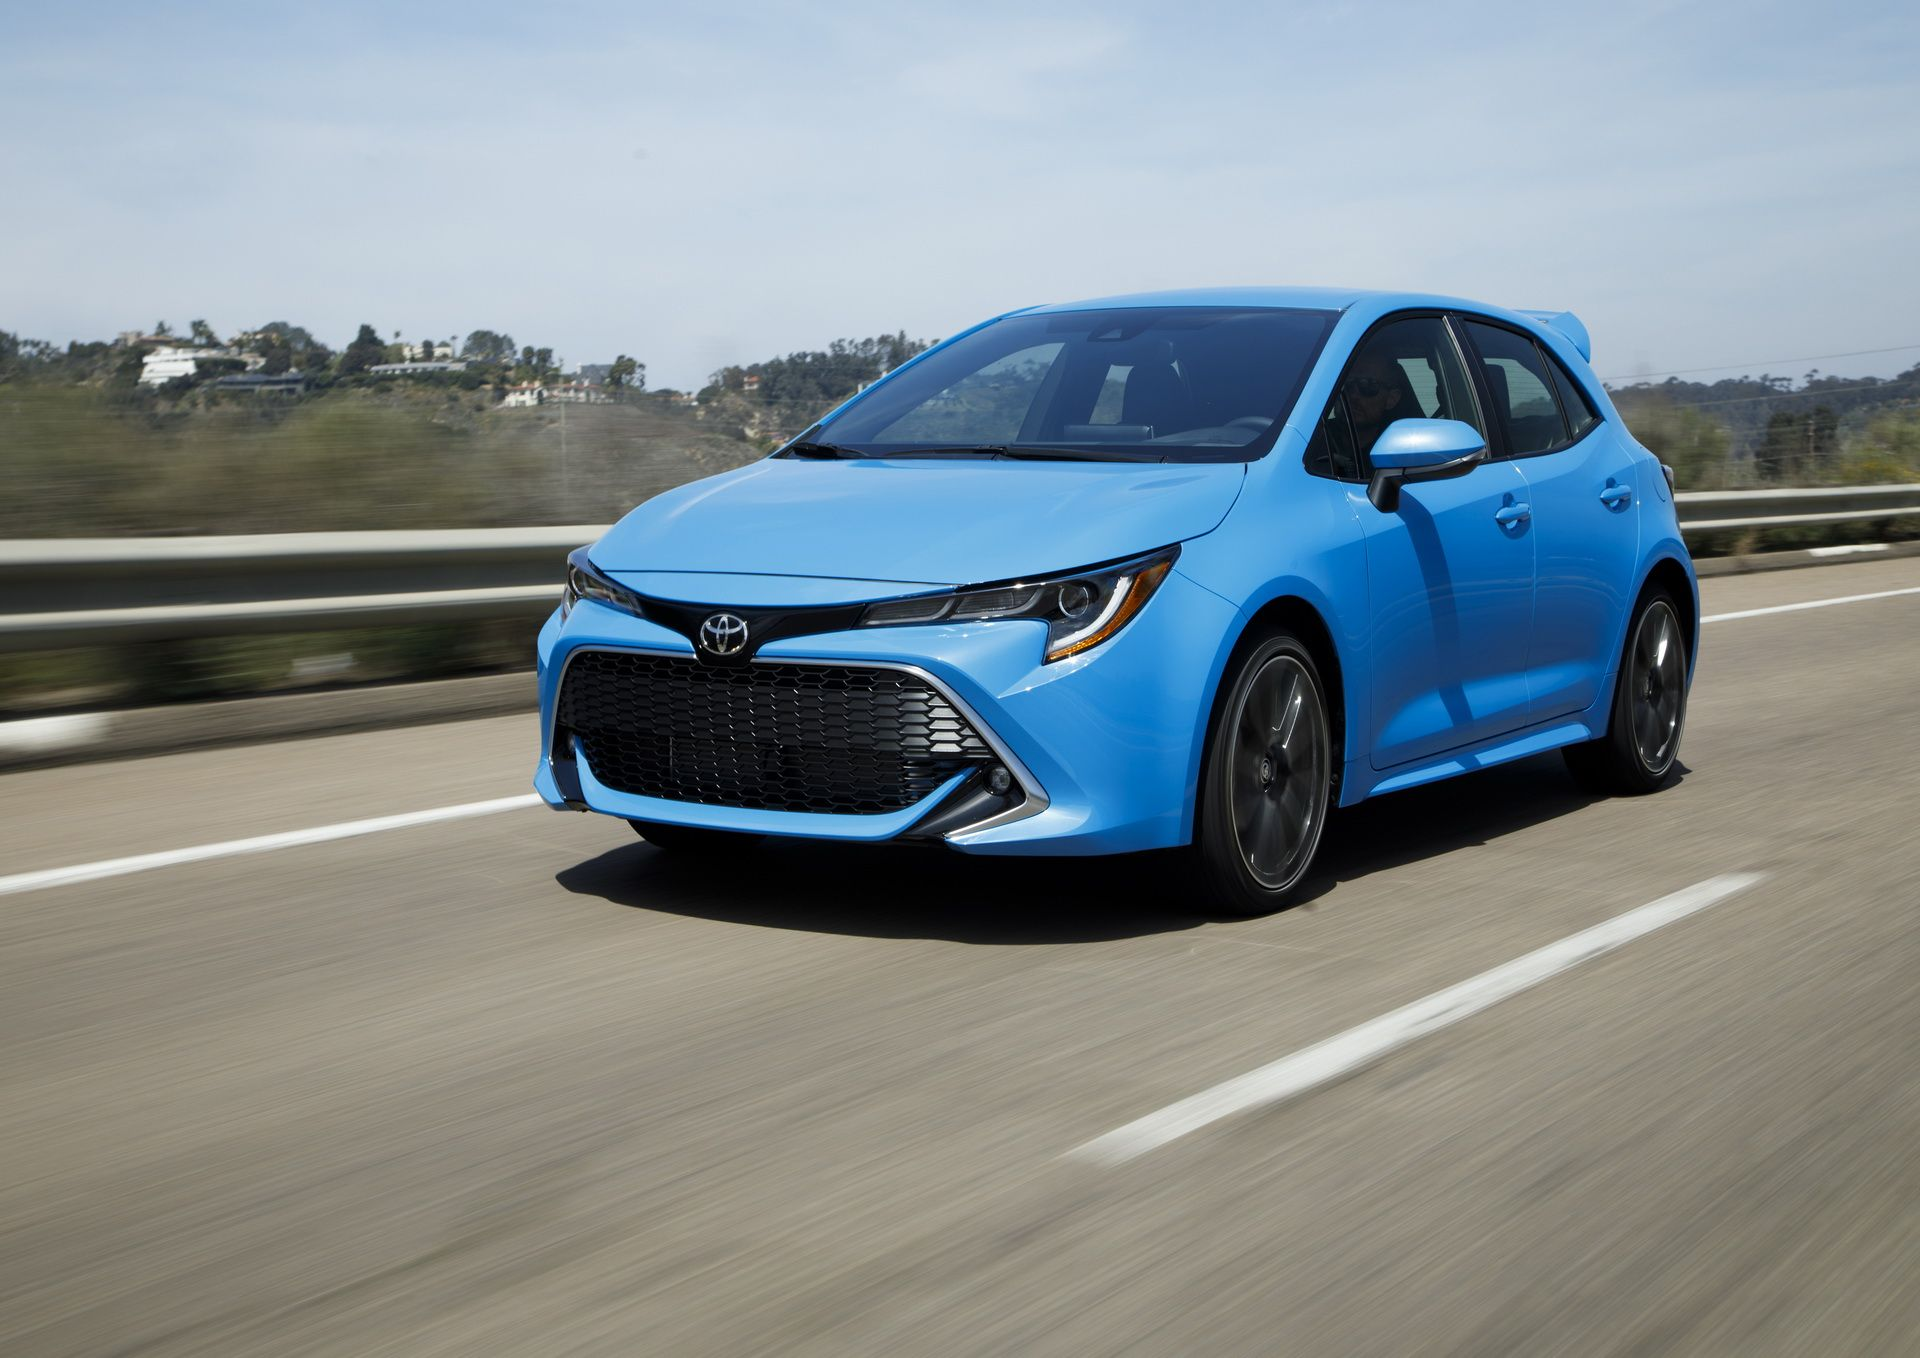 2019 Toyota Corolla Hatch Specs Announced, Reviews Are Also In - autoevolution